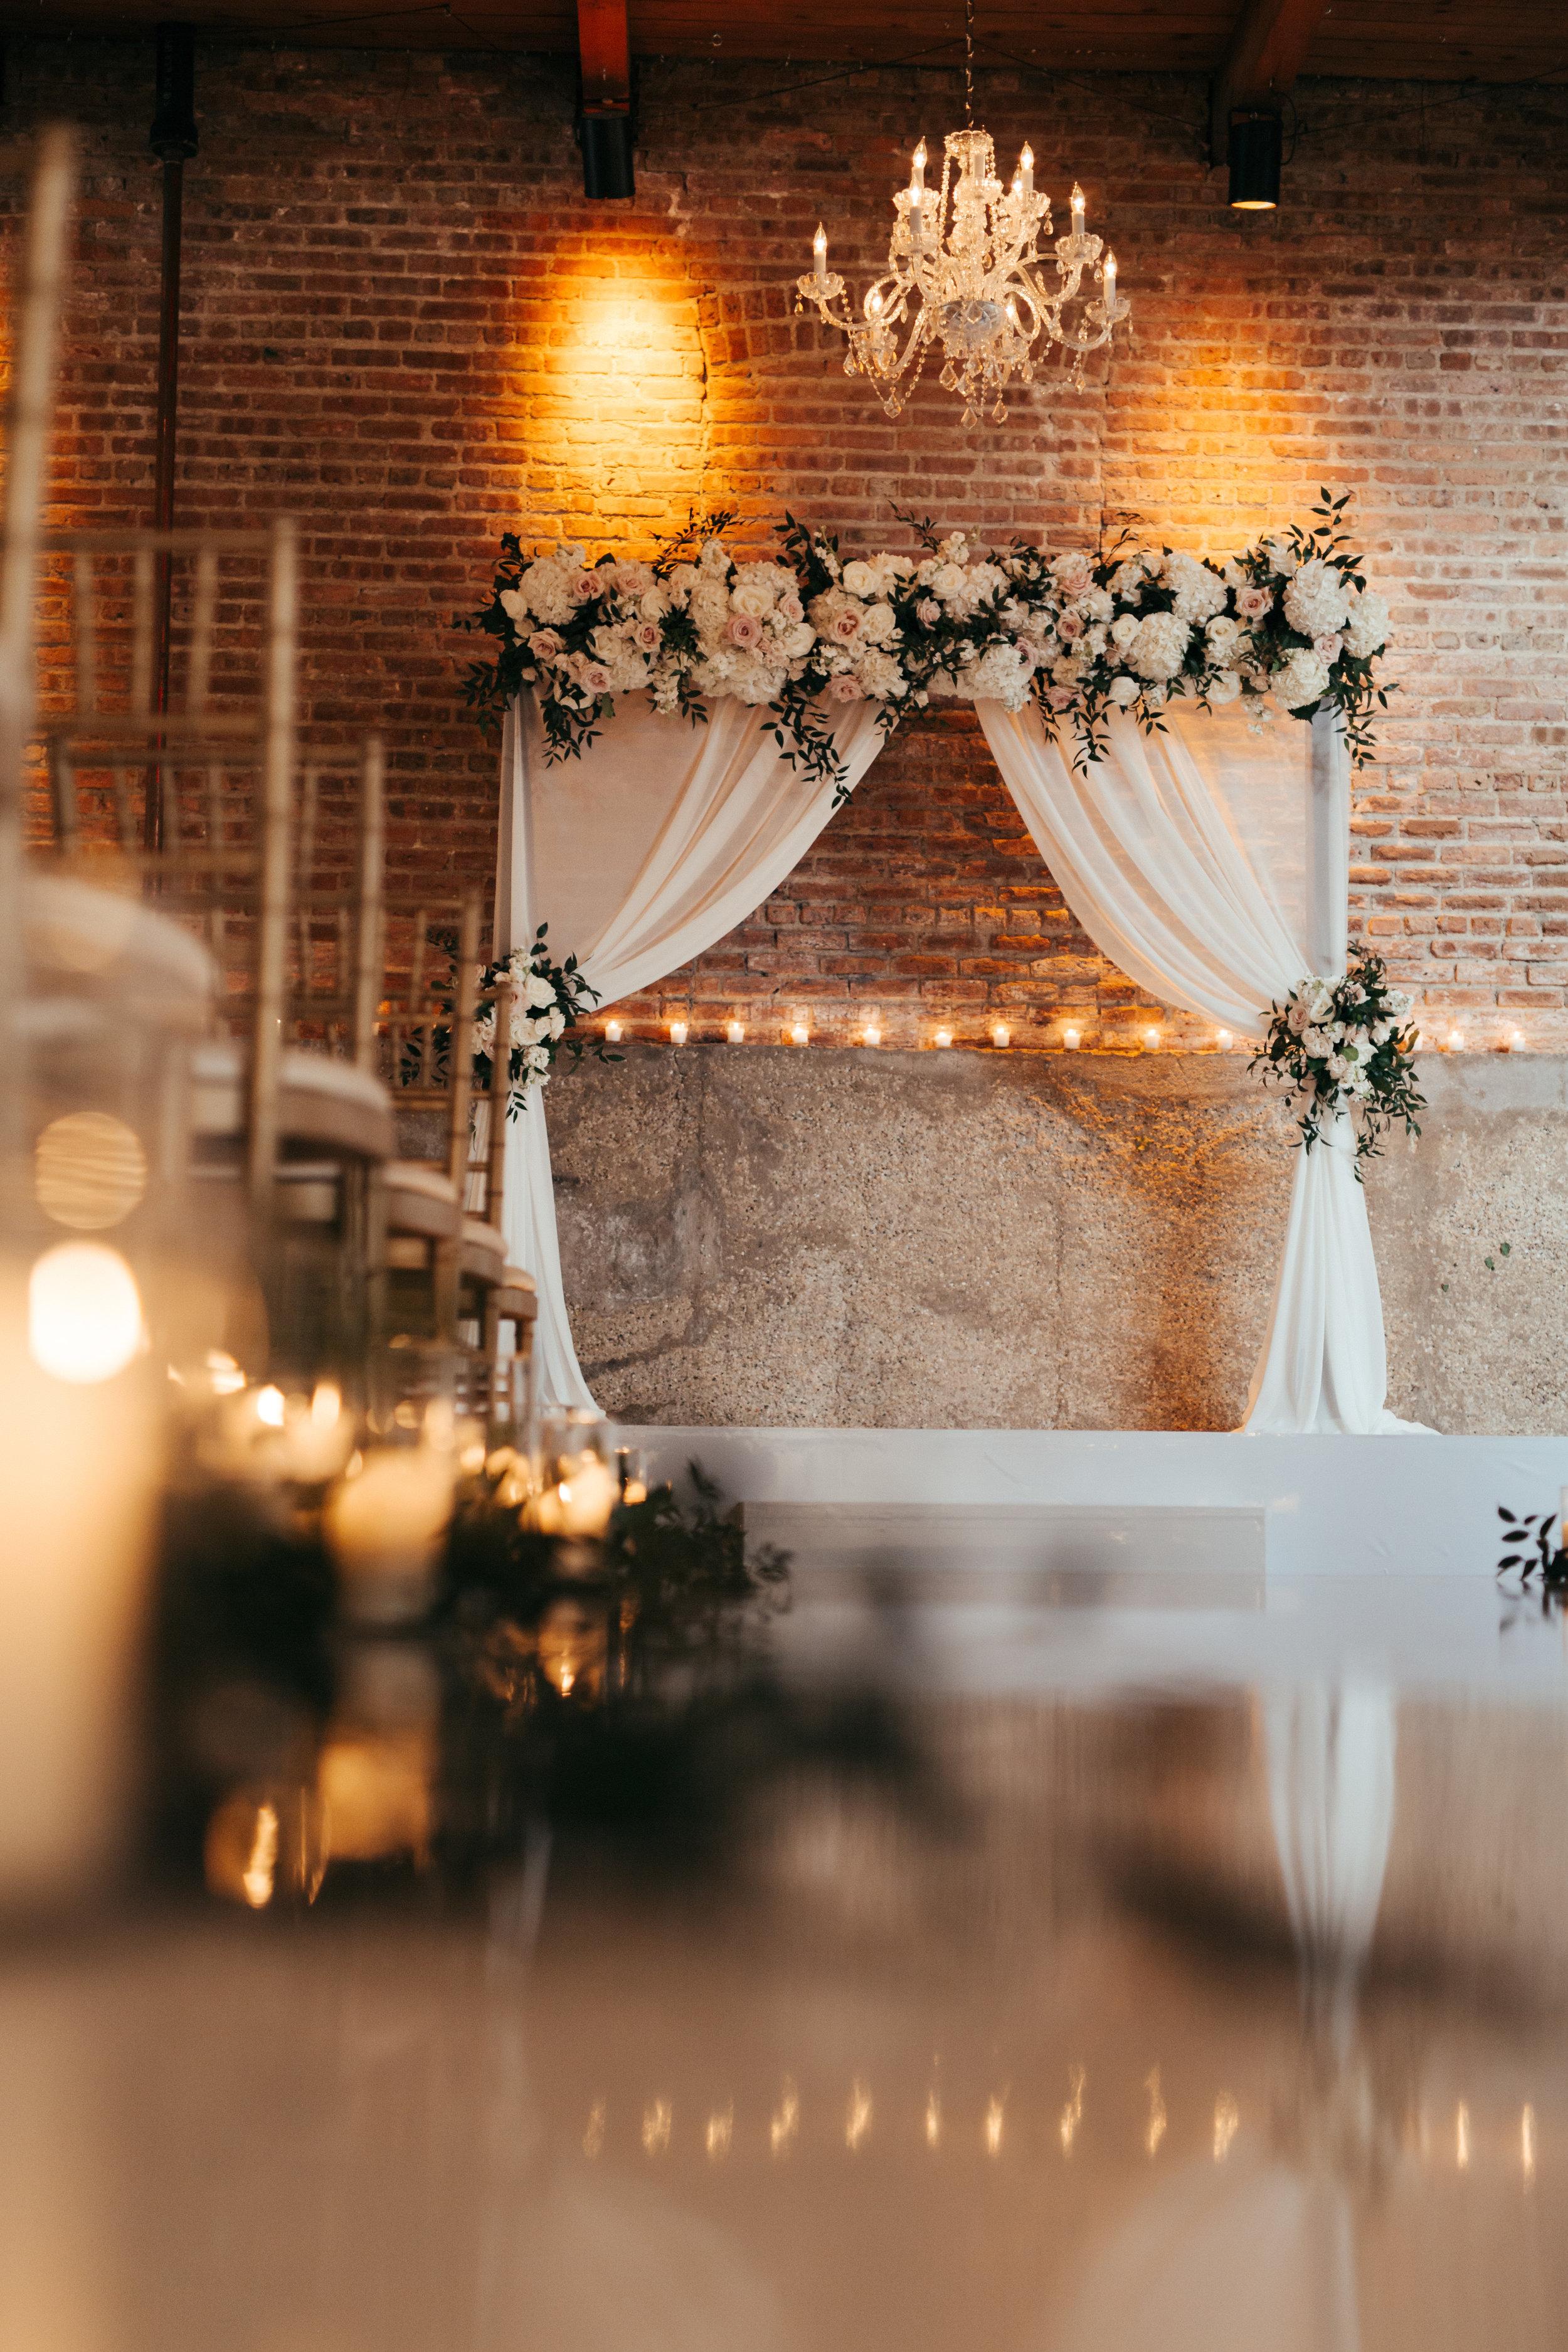 Mindy&Jared-wedding-by-LadiesAndGentlemen-by-Matija-Vuri-3096.jpg